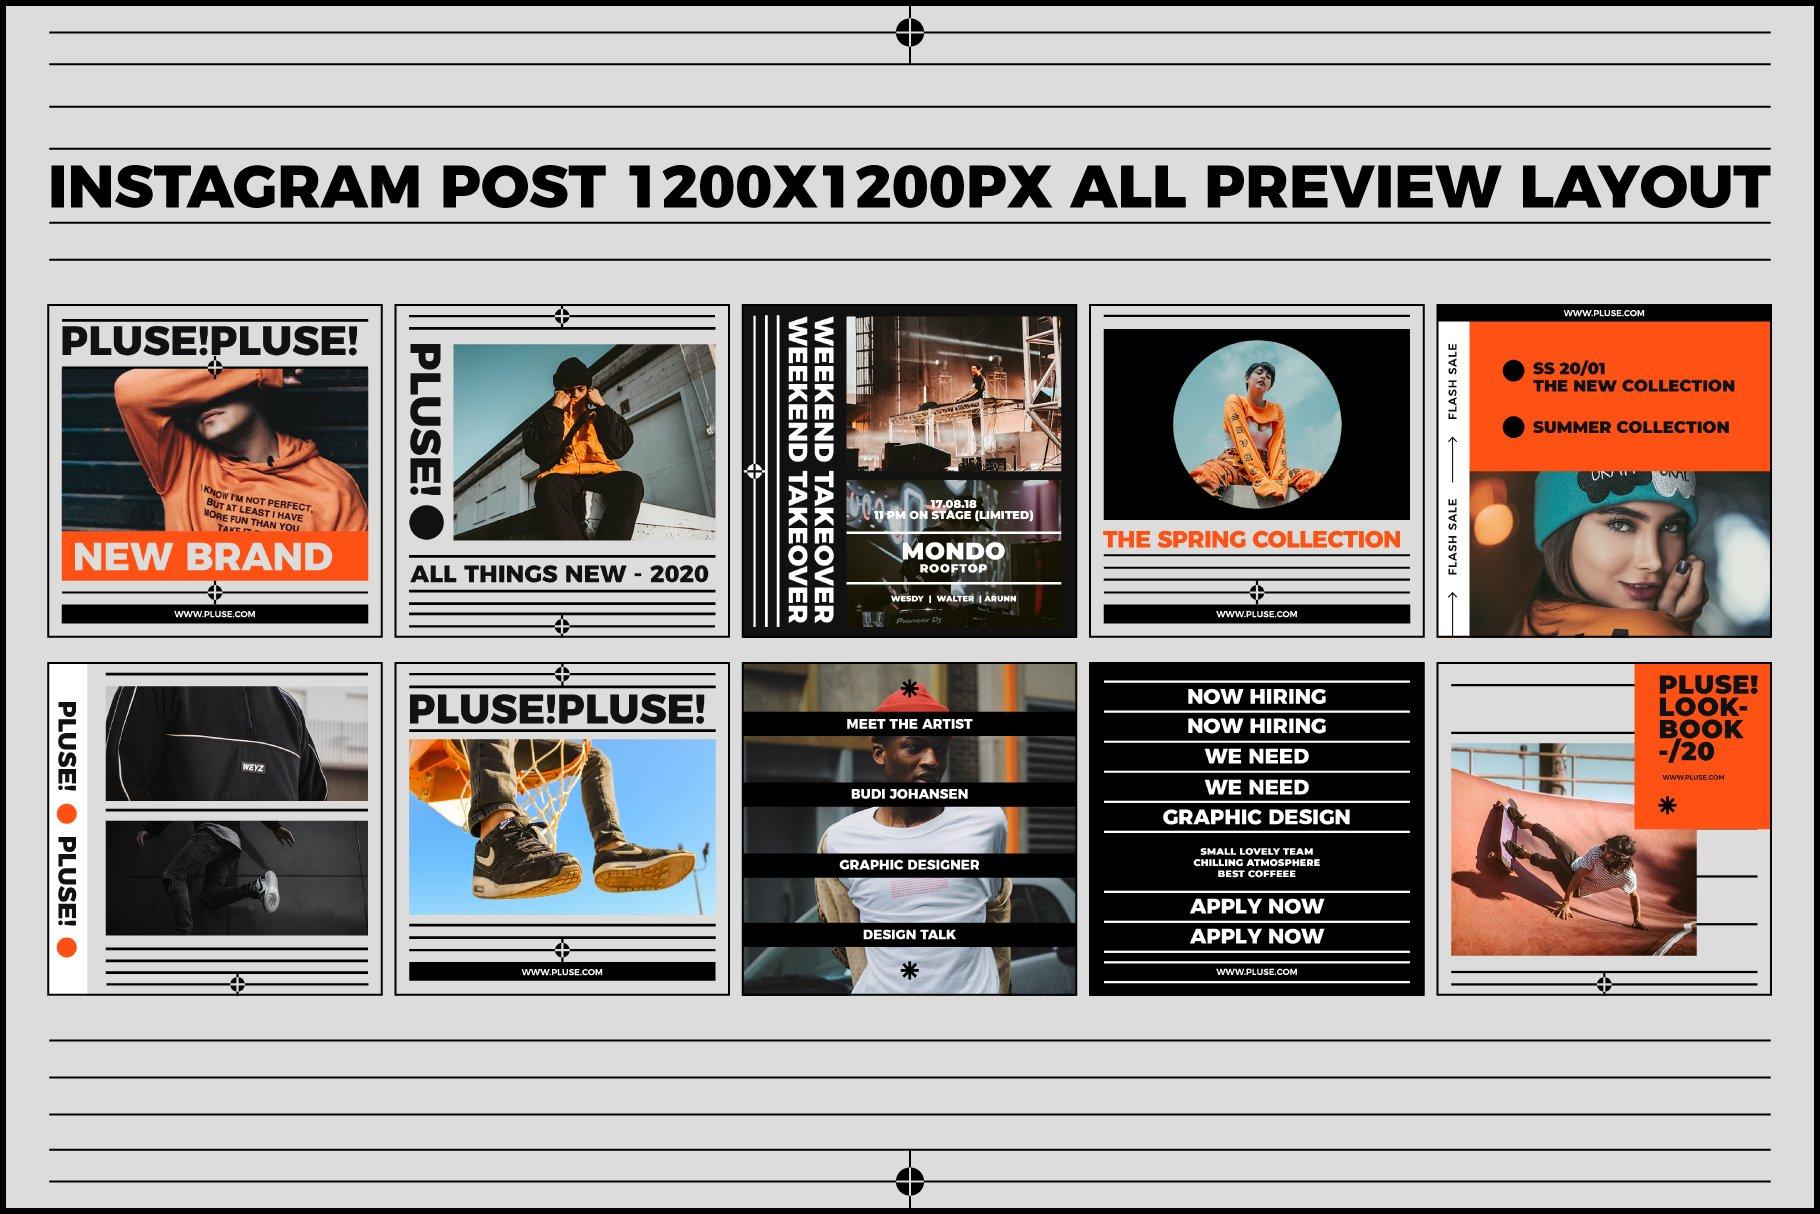 pluse! preview marketplace creative market 09 11